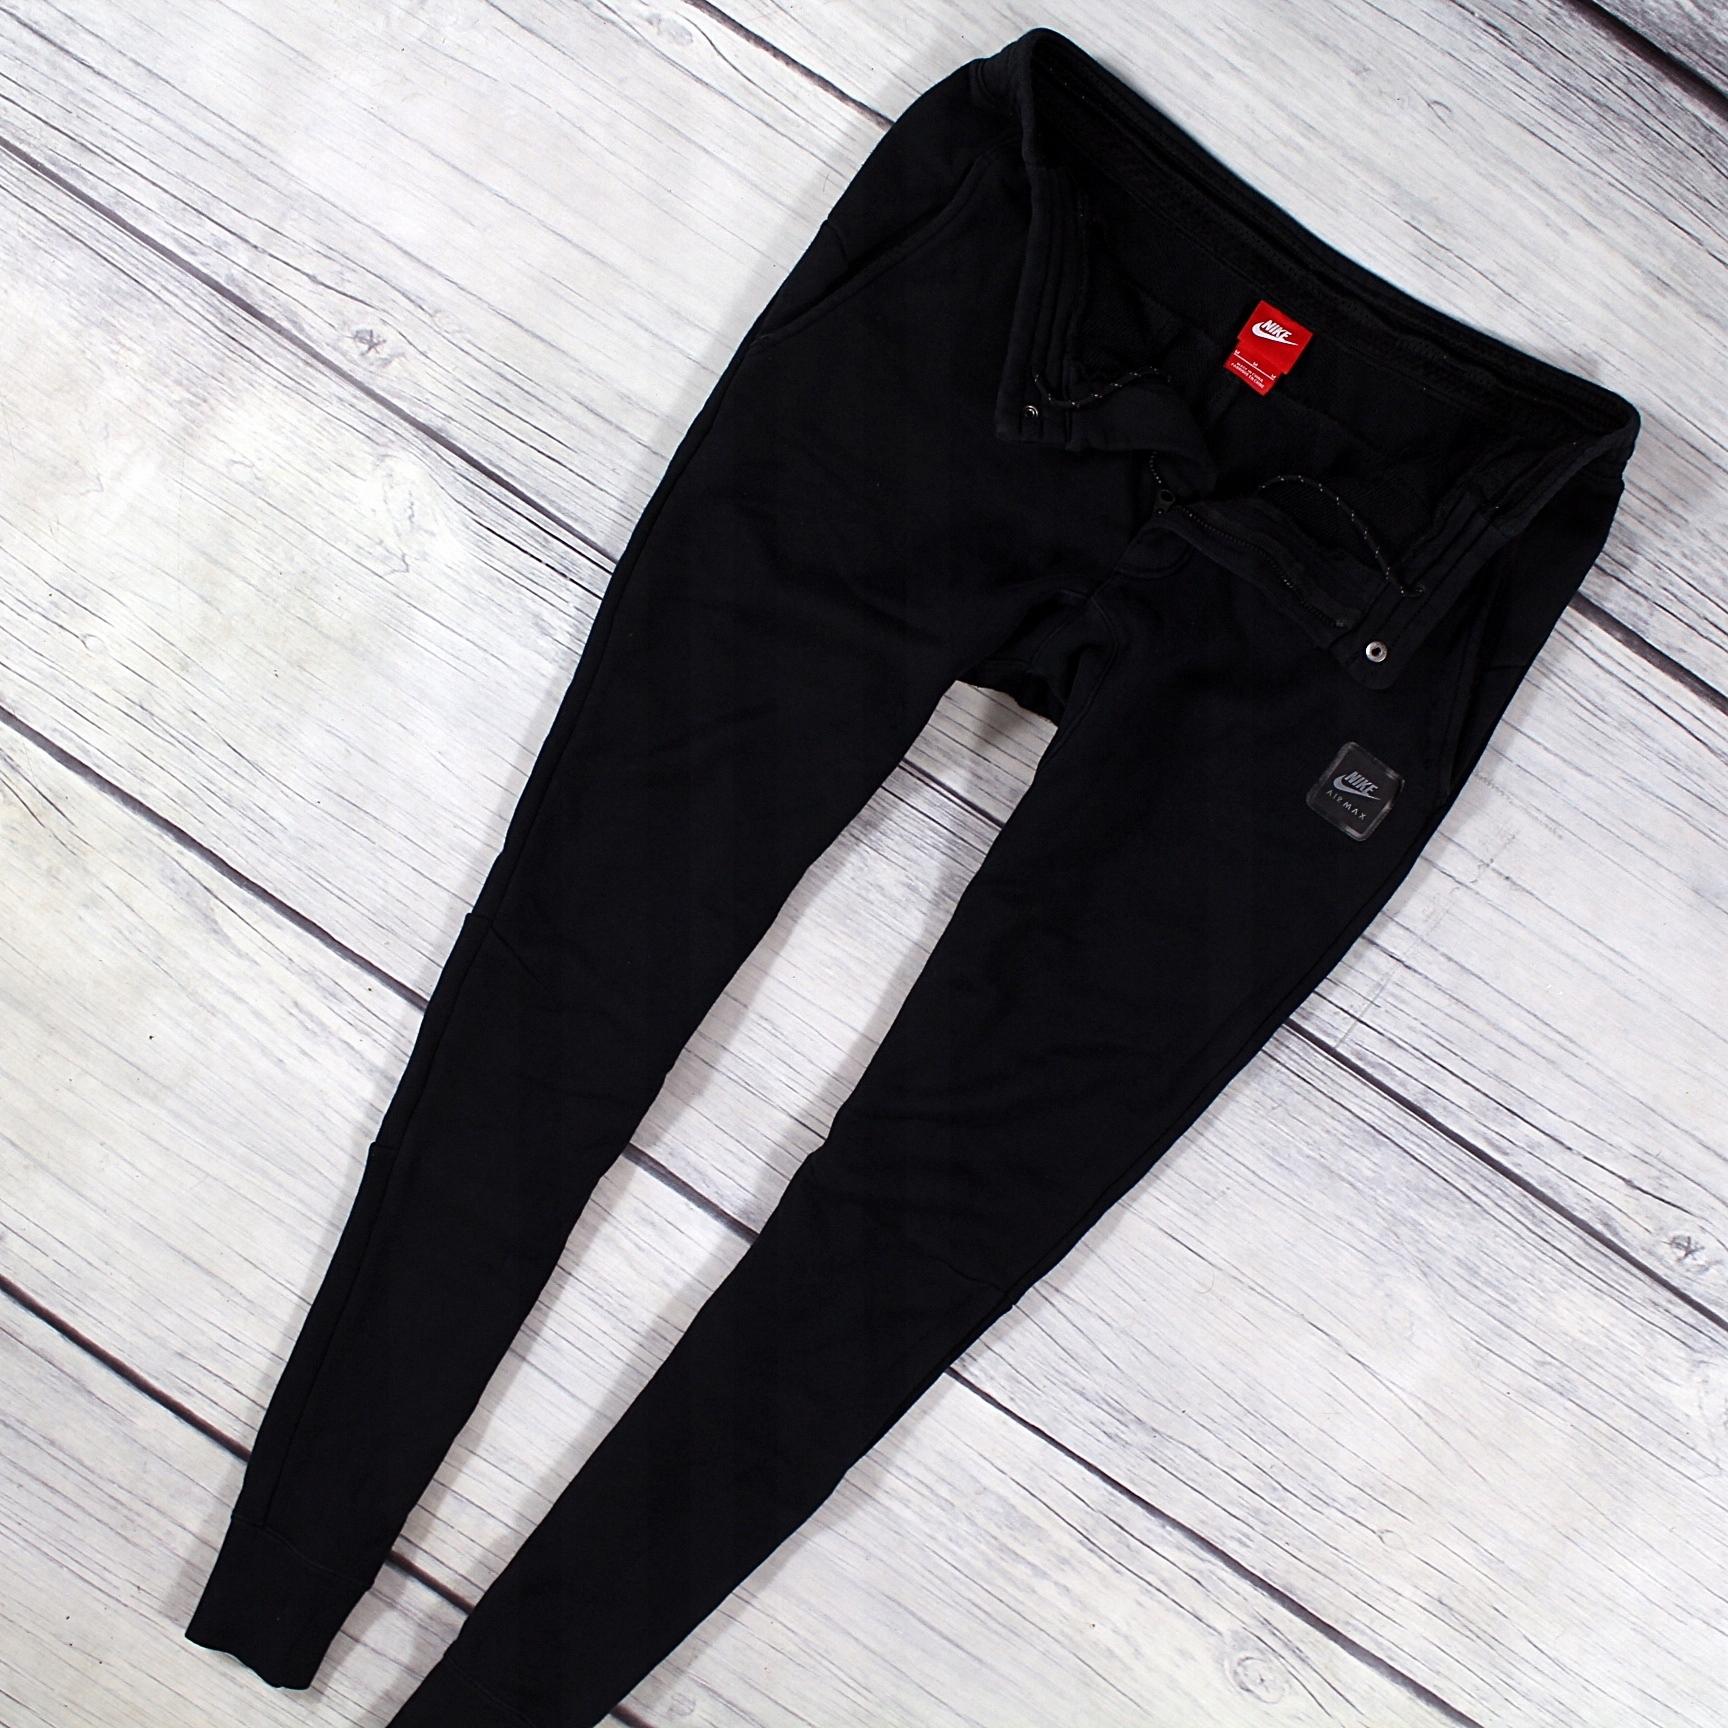 9ad9ec013 NIKE AIR MAX Spodnie Dresowe Slim Fit NOWY MODEL M - 7577007172 ...